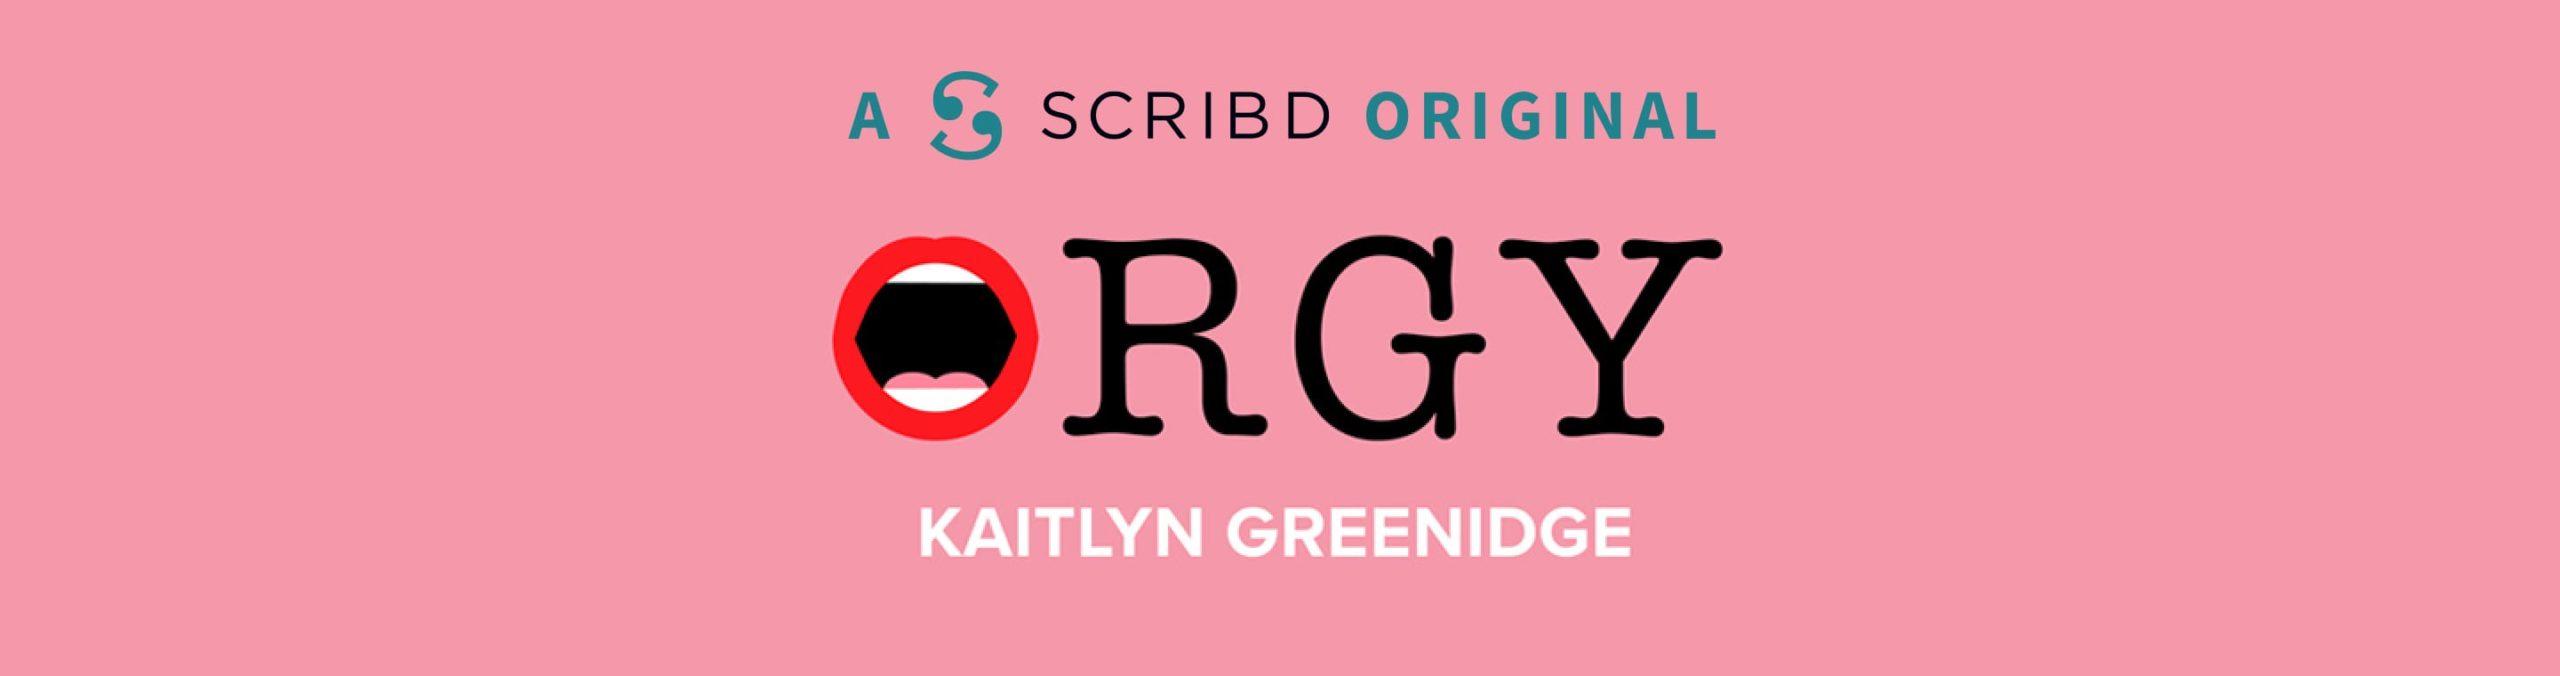 Kaitlyn Greenidge on the joys of sex